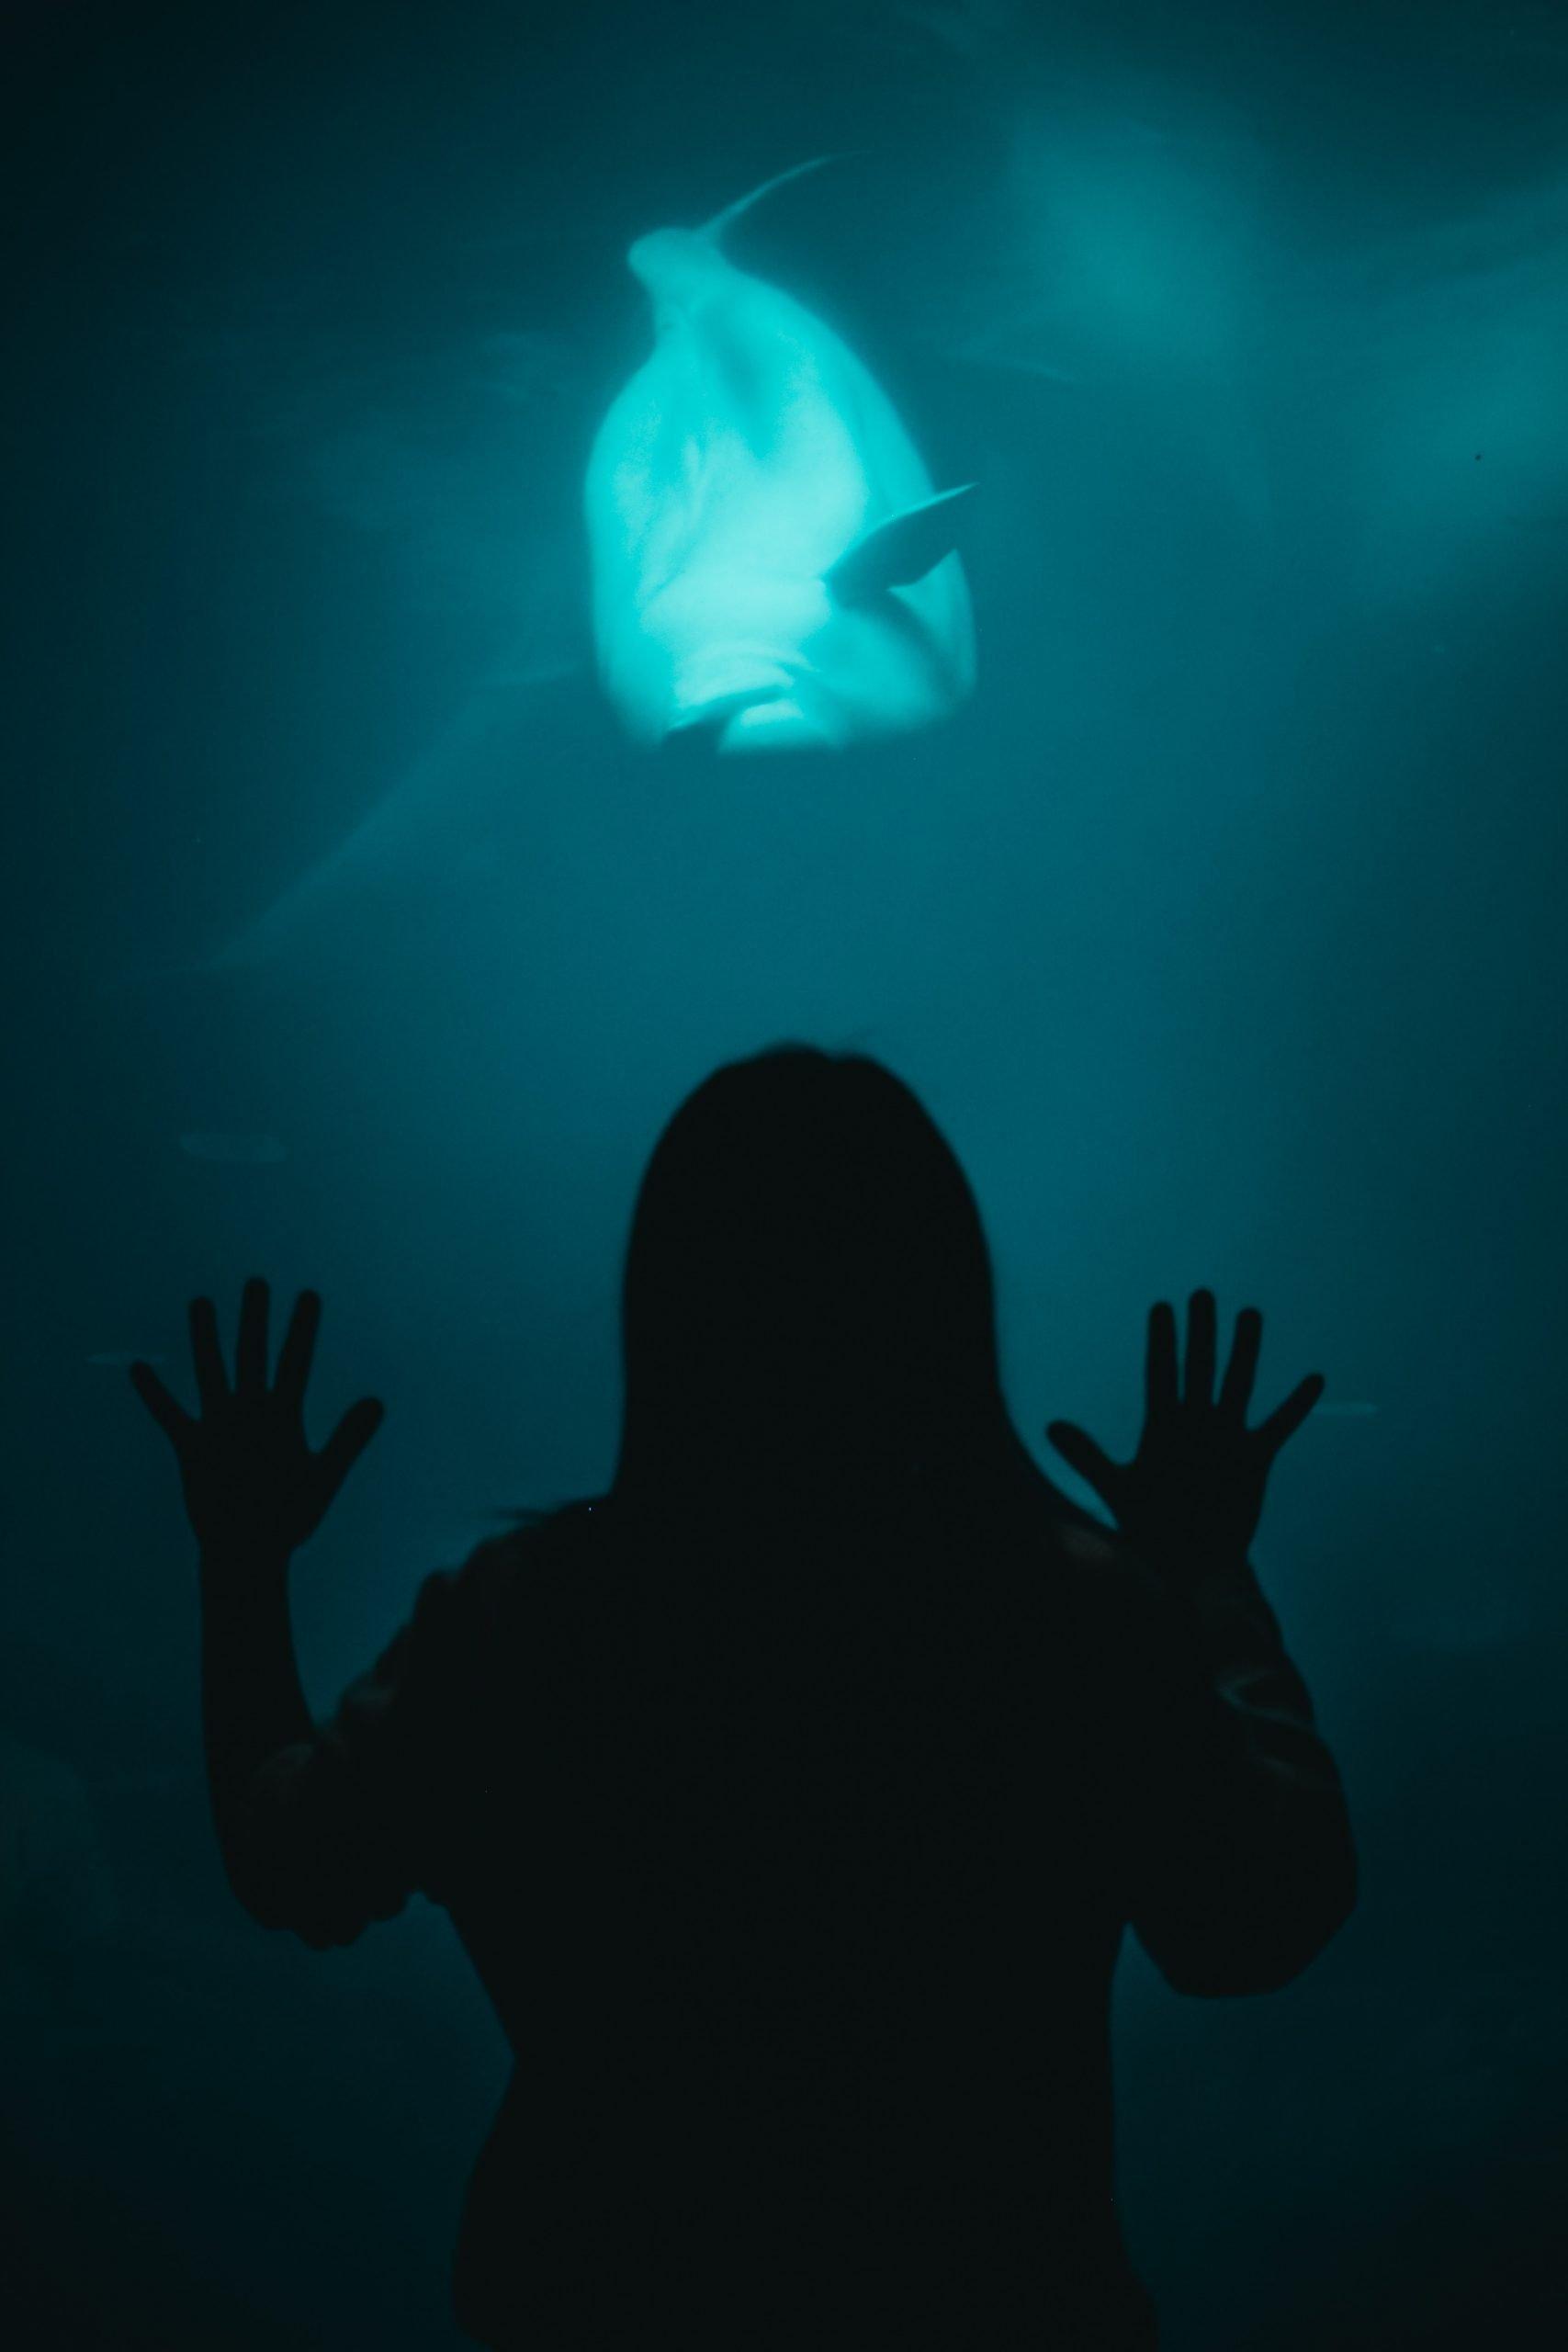 Acquarium.Whale.Silouette